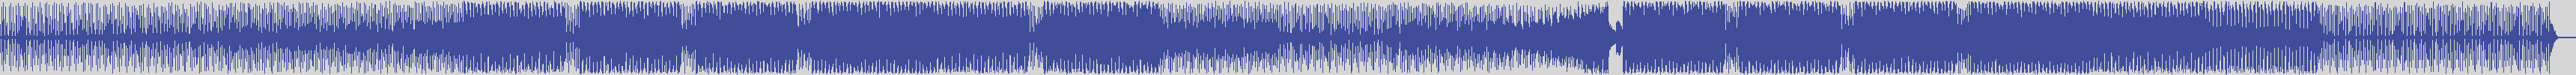 bunny_clan [BYC036] Alessandro Angileri - Free Calling [Original Mix] audio wave form